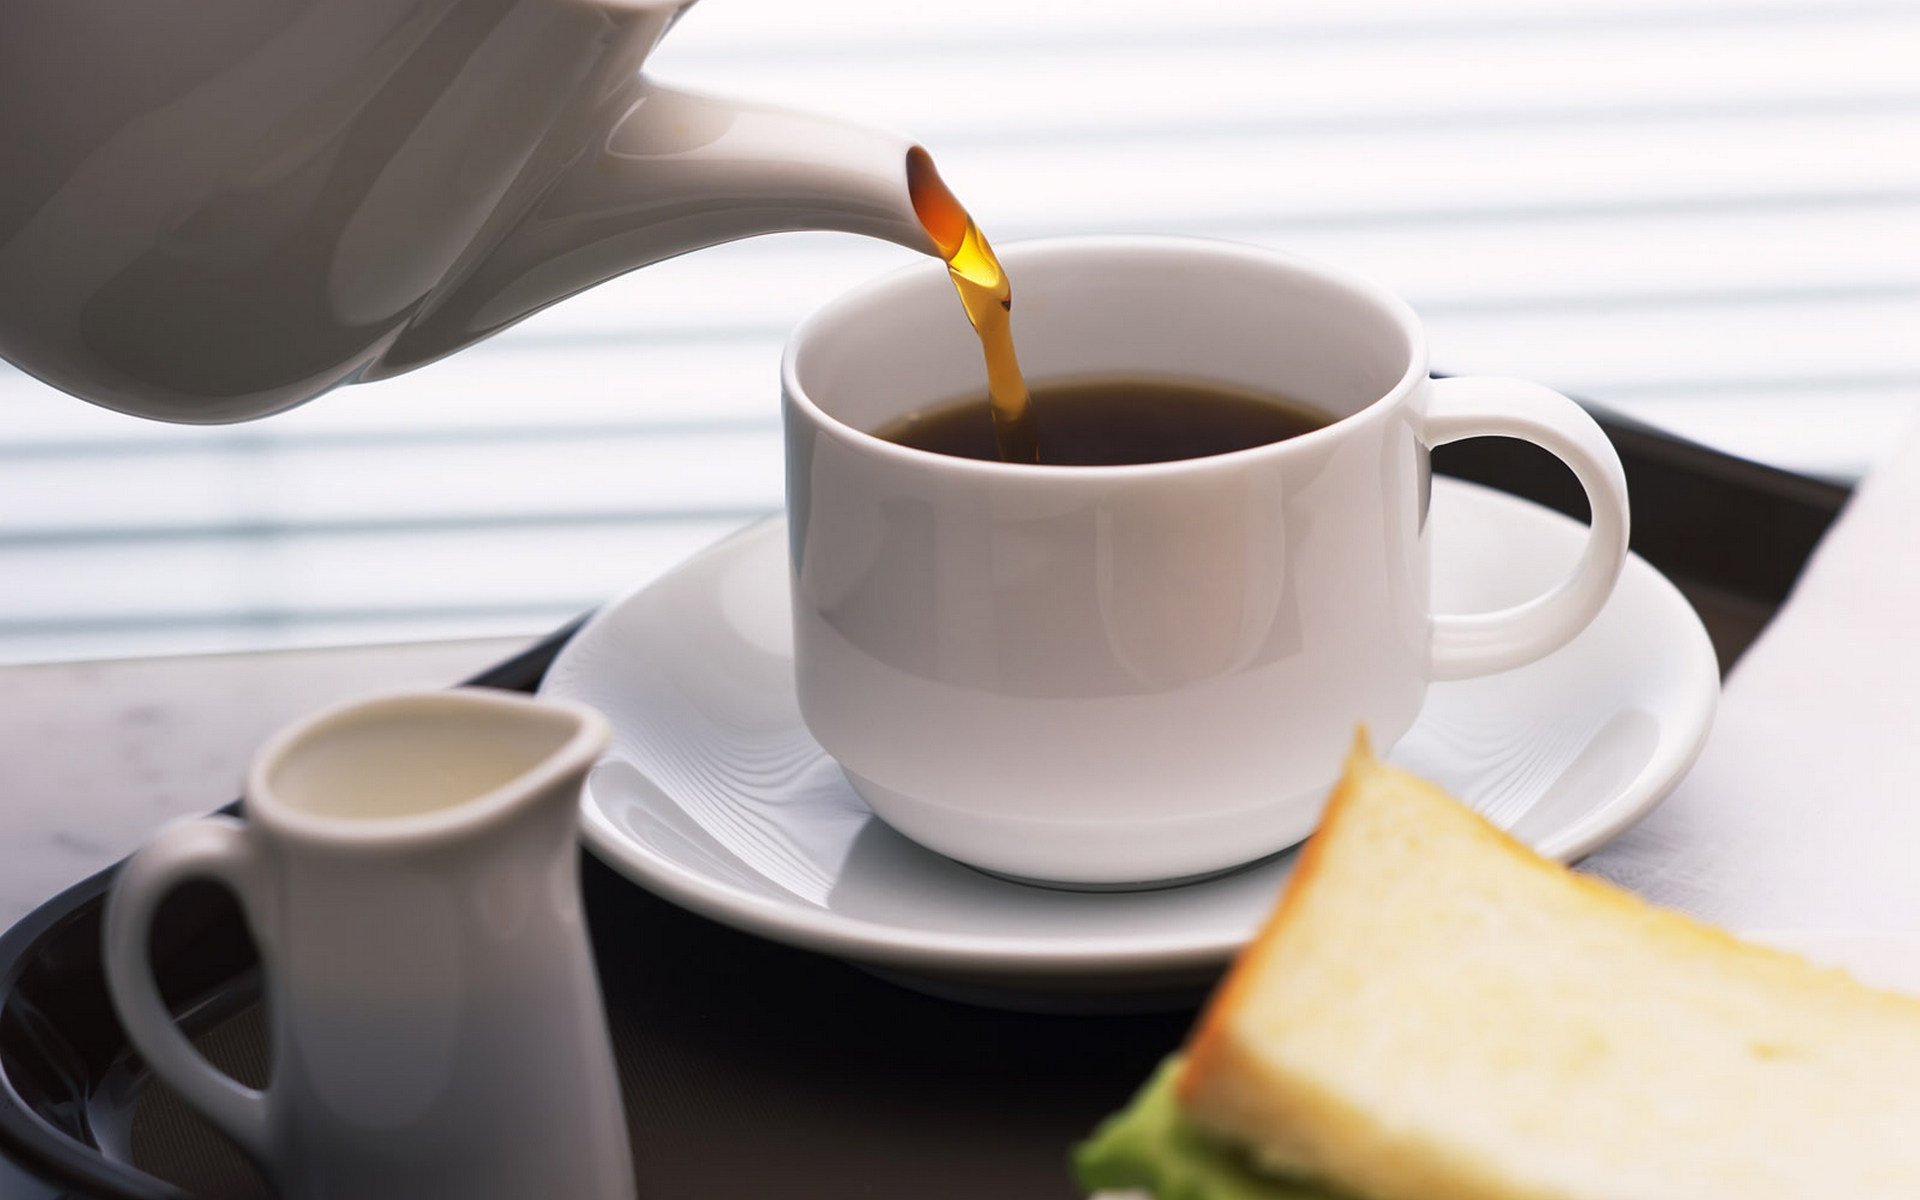 чайник, заварник, чай